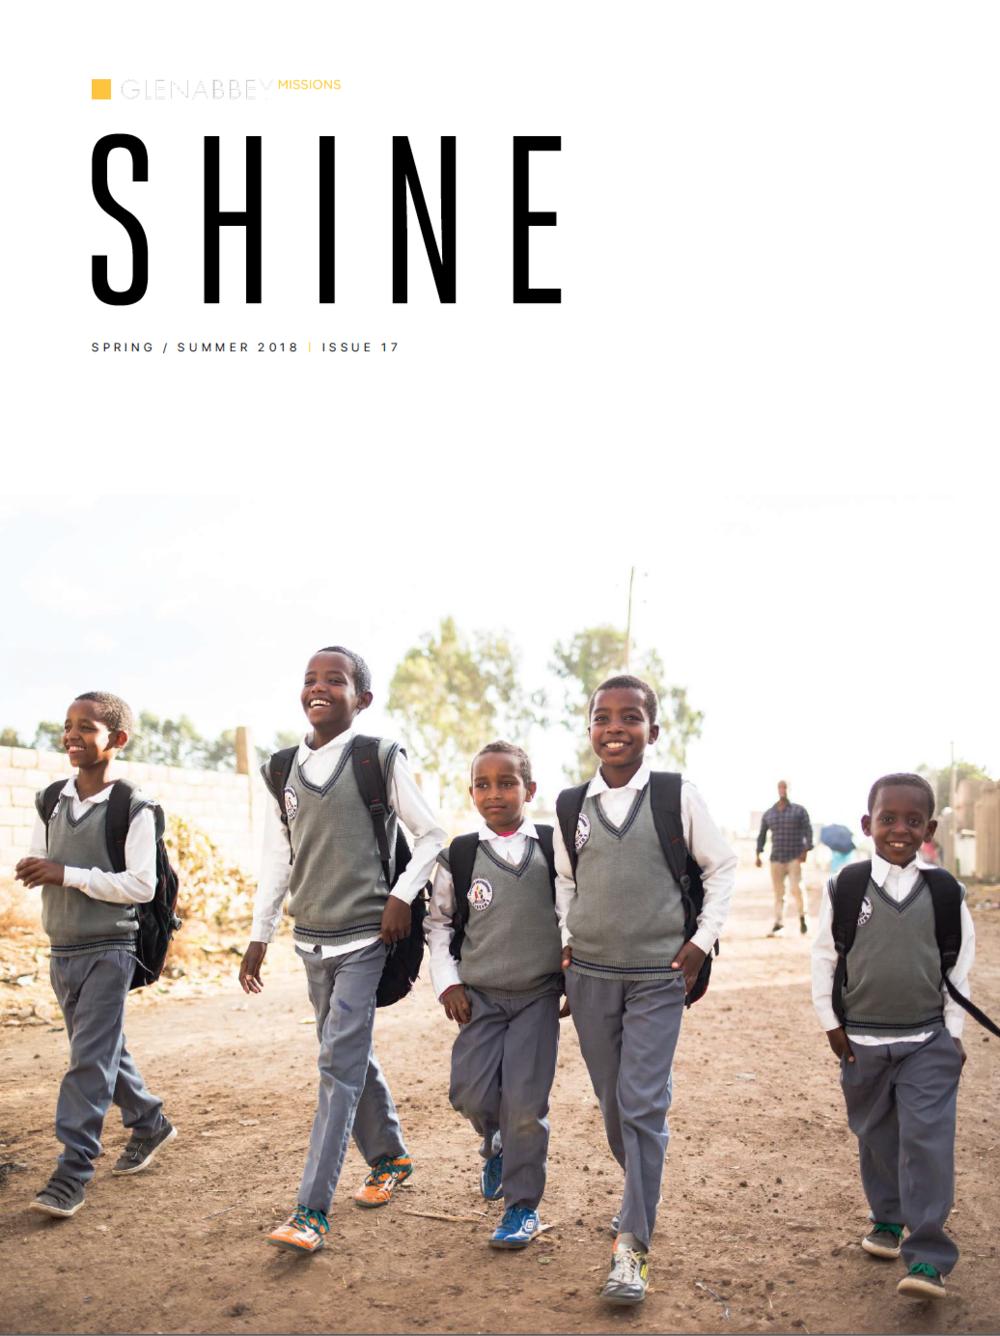 Shine Issue 17 -Spring / Summer 2018